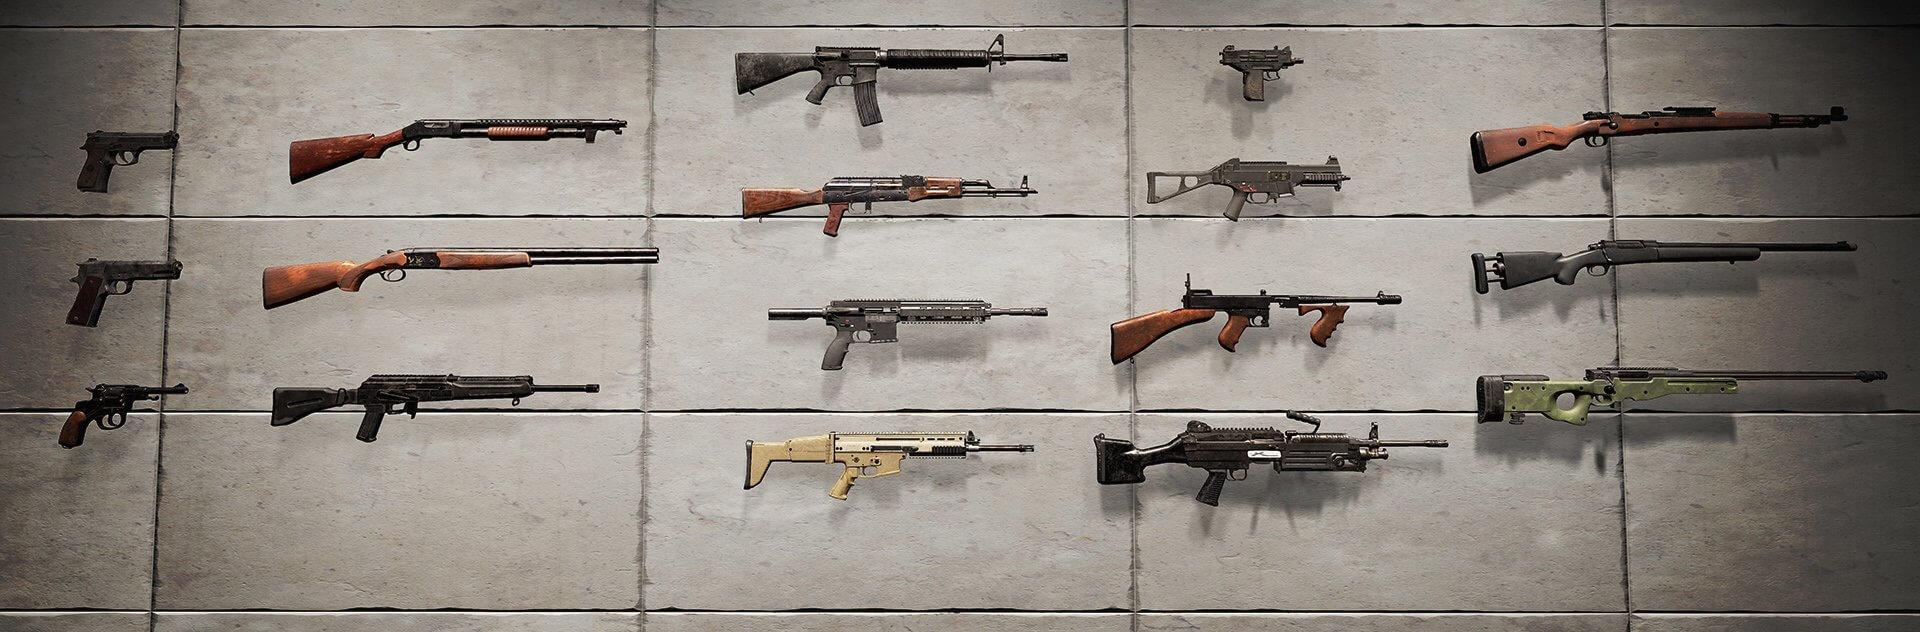 pubg en iyi silahlar